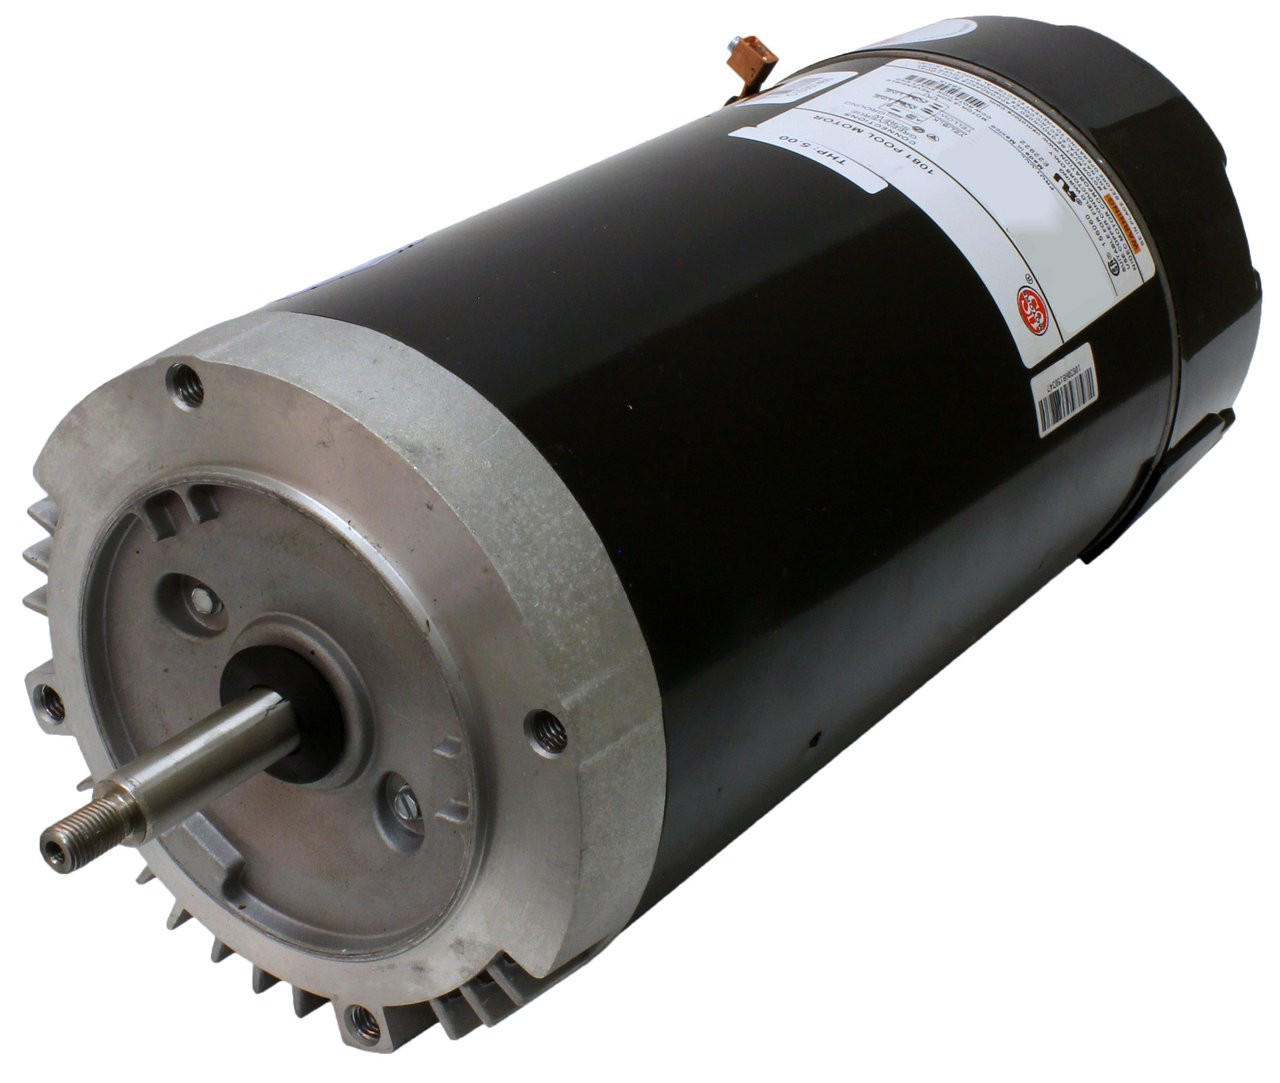 hp rpm j frame v switchless swimming pool pump pool pump motor us electric motor asb809 image 1